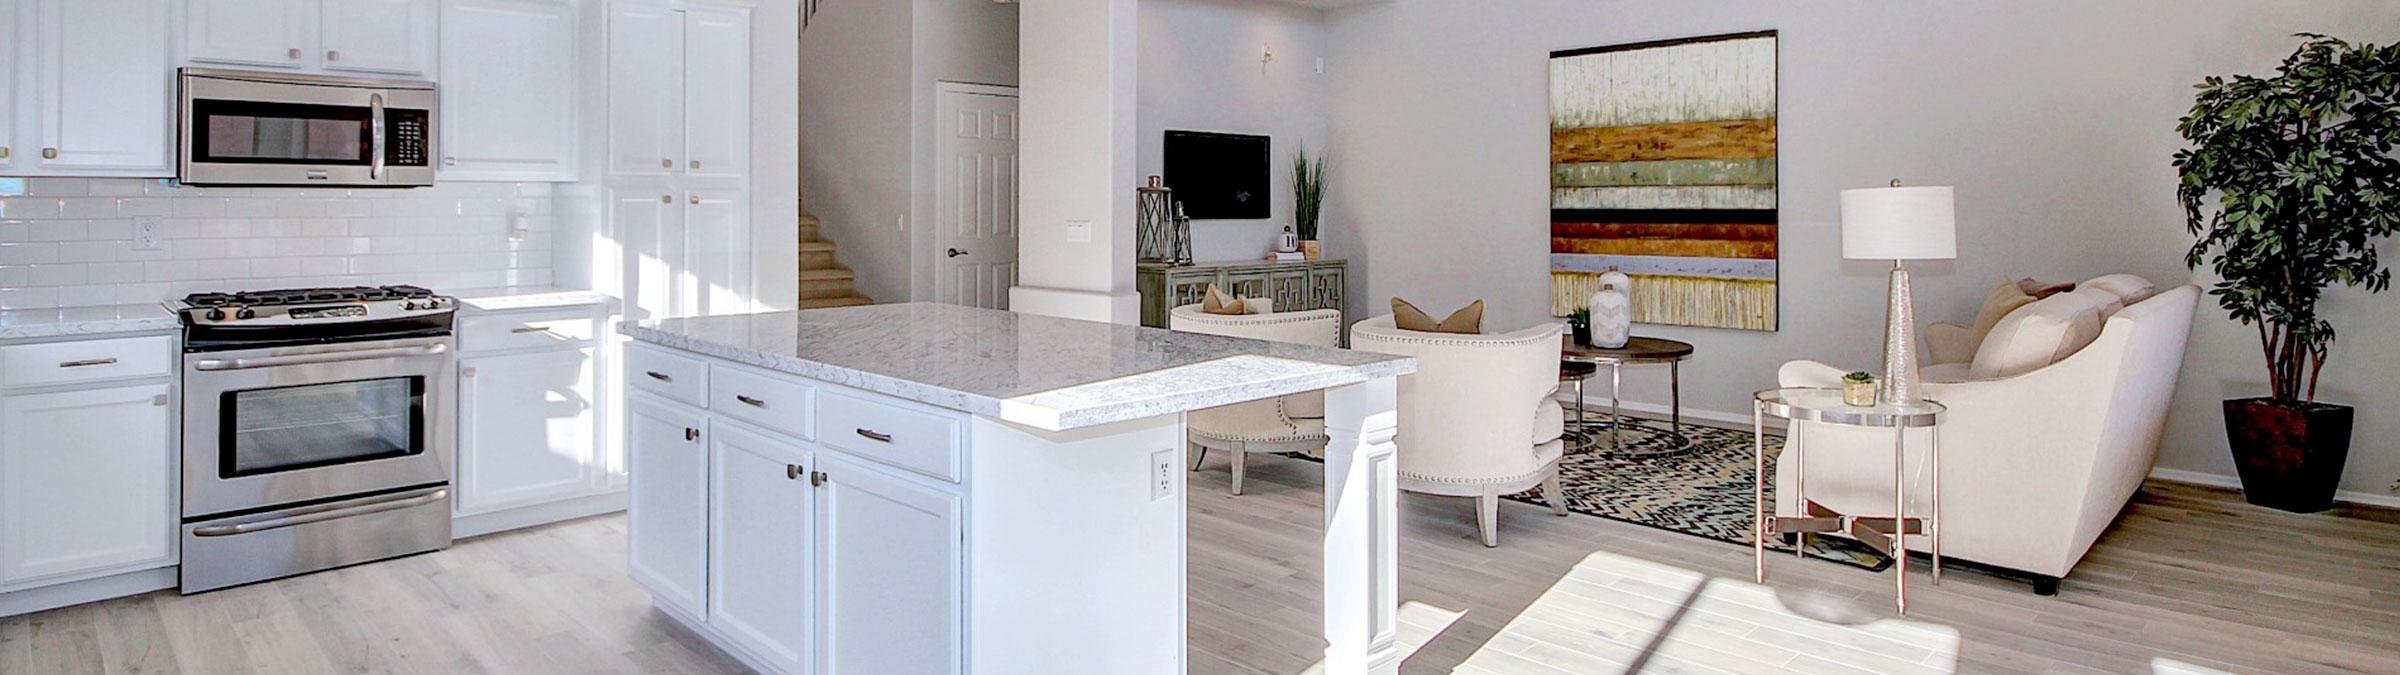 Arcadia Houses For Sale - The Mojo Team Scottsdale